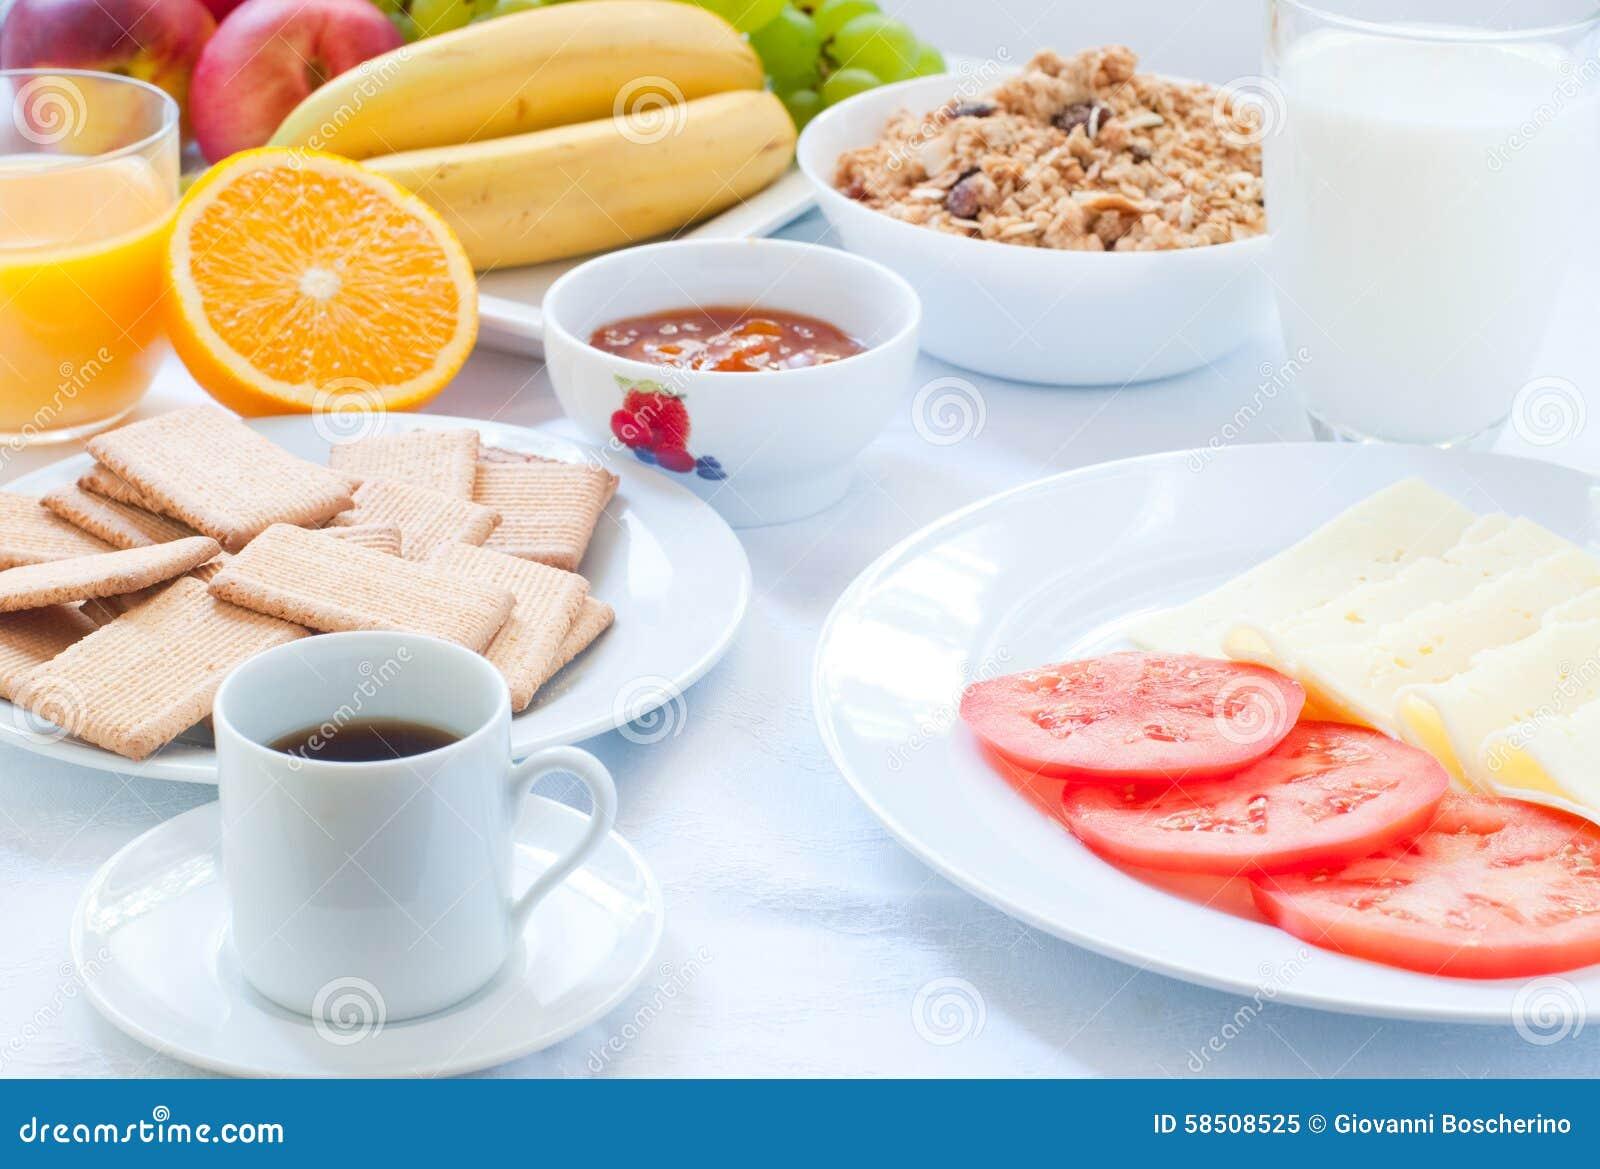 Continentaal ontbijt met fruit, koffie, kaas